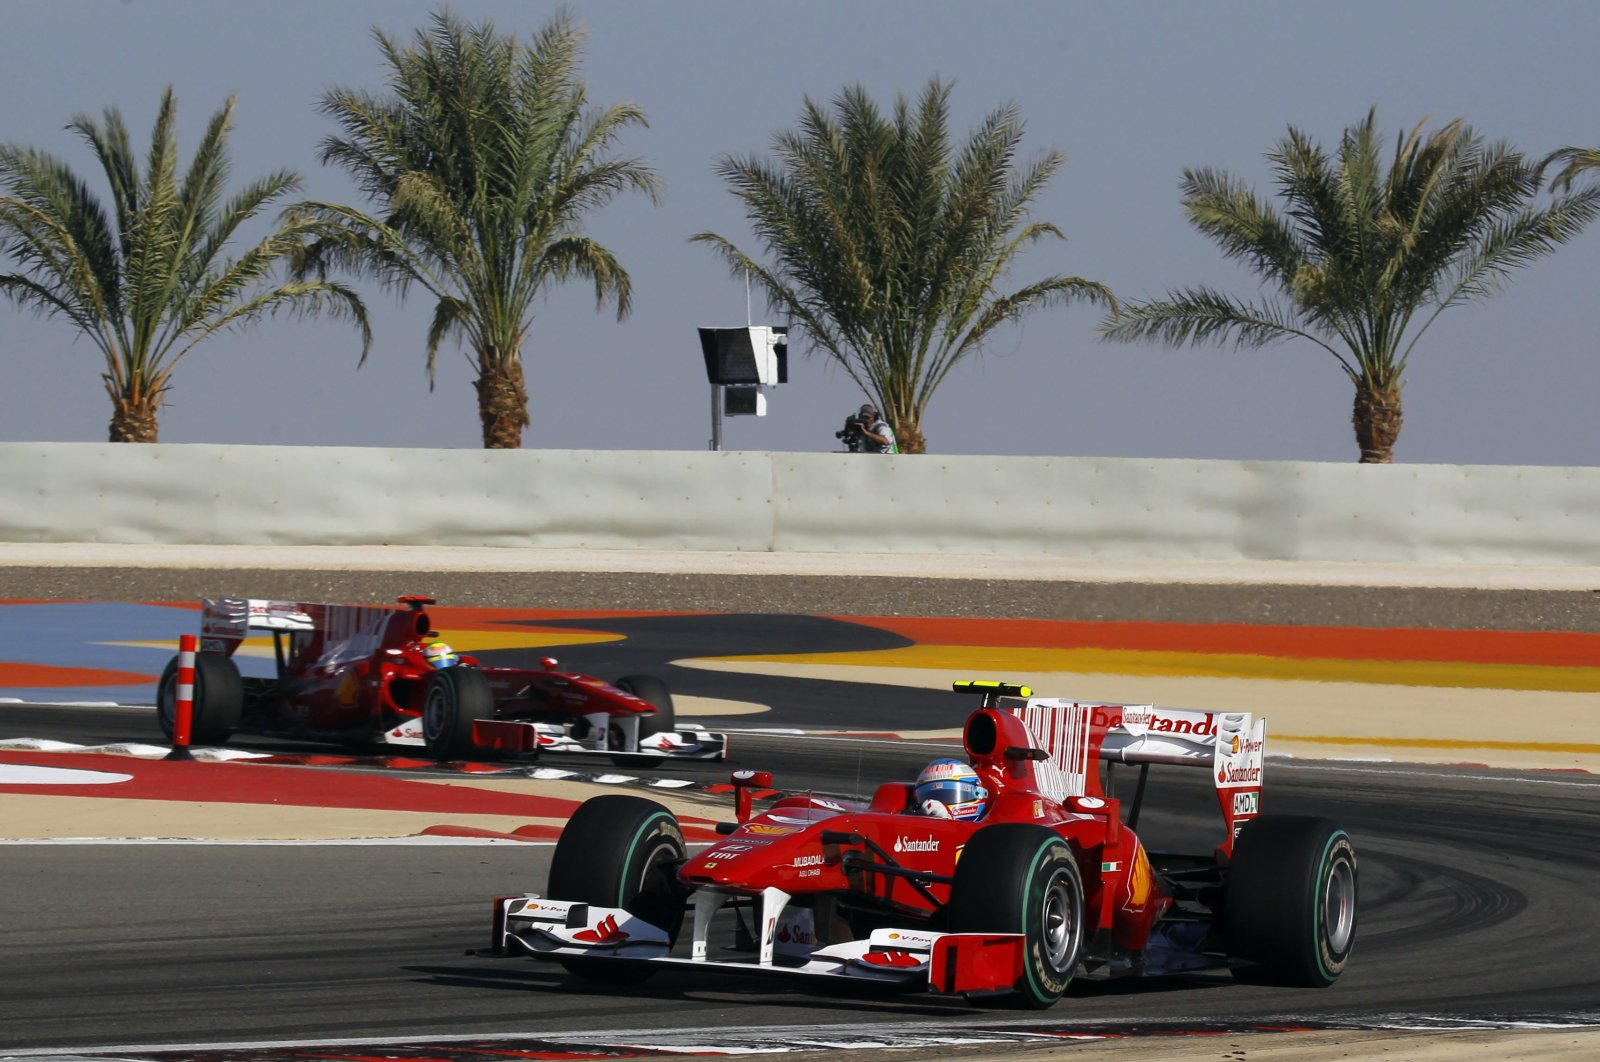 Ferrari Formula One driver Fernando Alonso of Spain leads teammate Felipe Massa of Brazil during the Bahrain F1 Grand Prix at Sakhir circuit in Manama March 14, 2010. (Reuters File Photo)